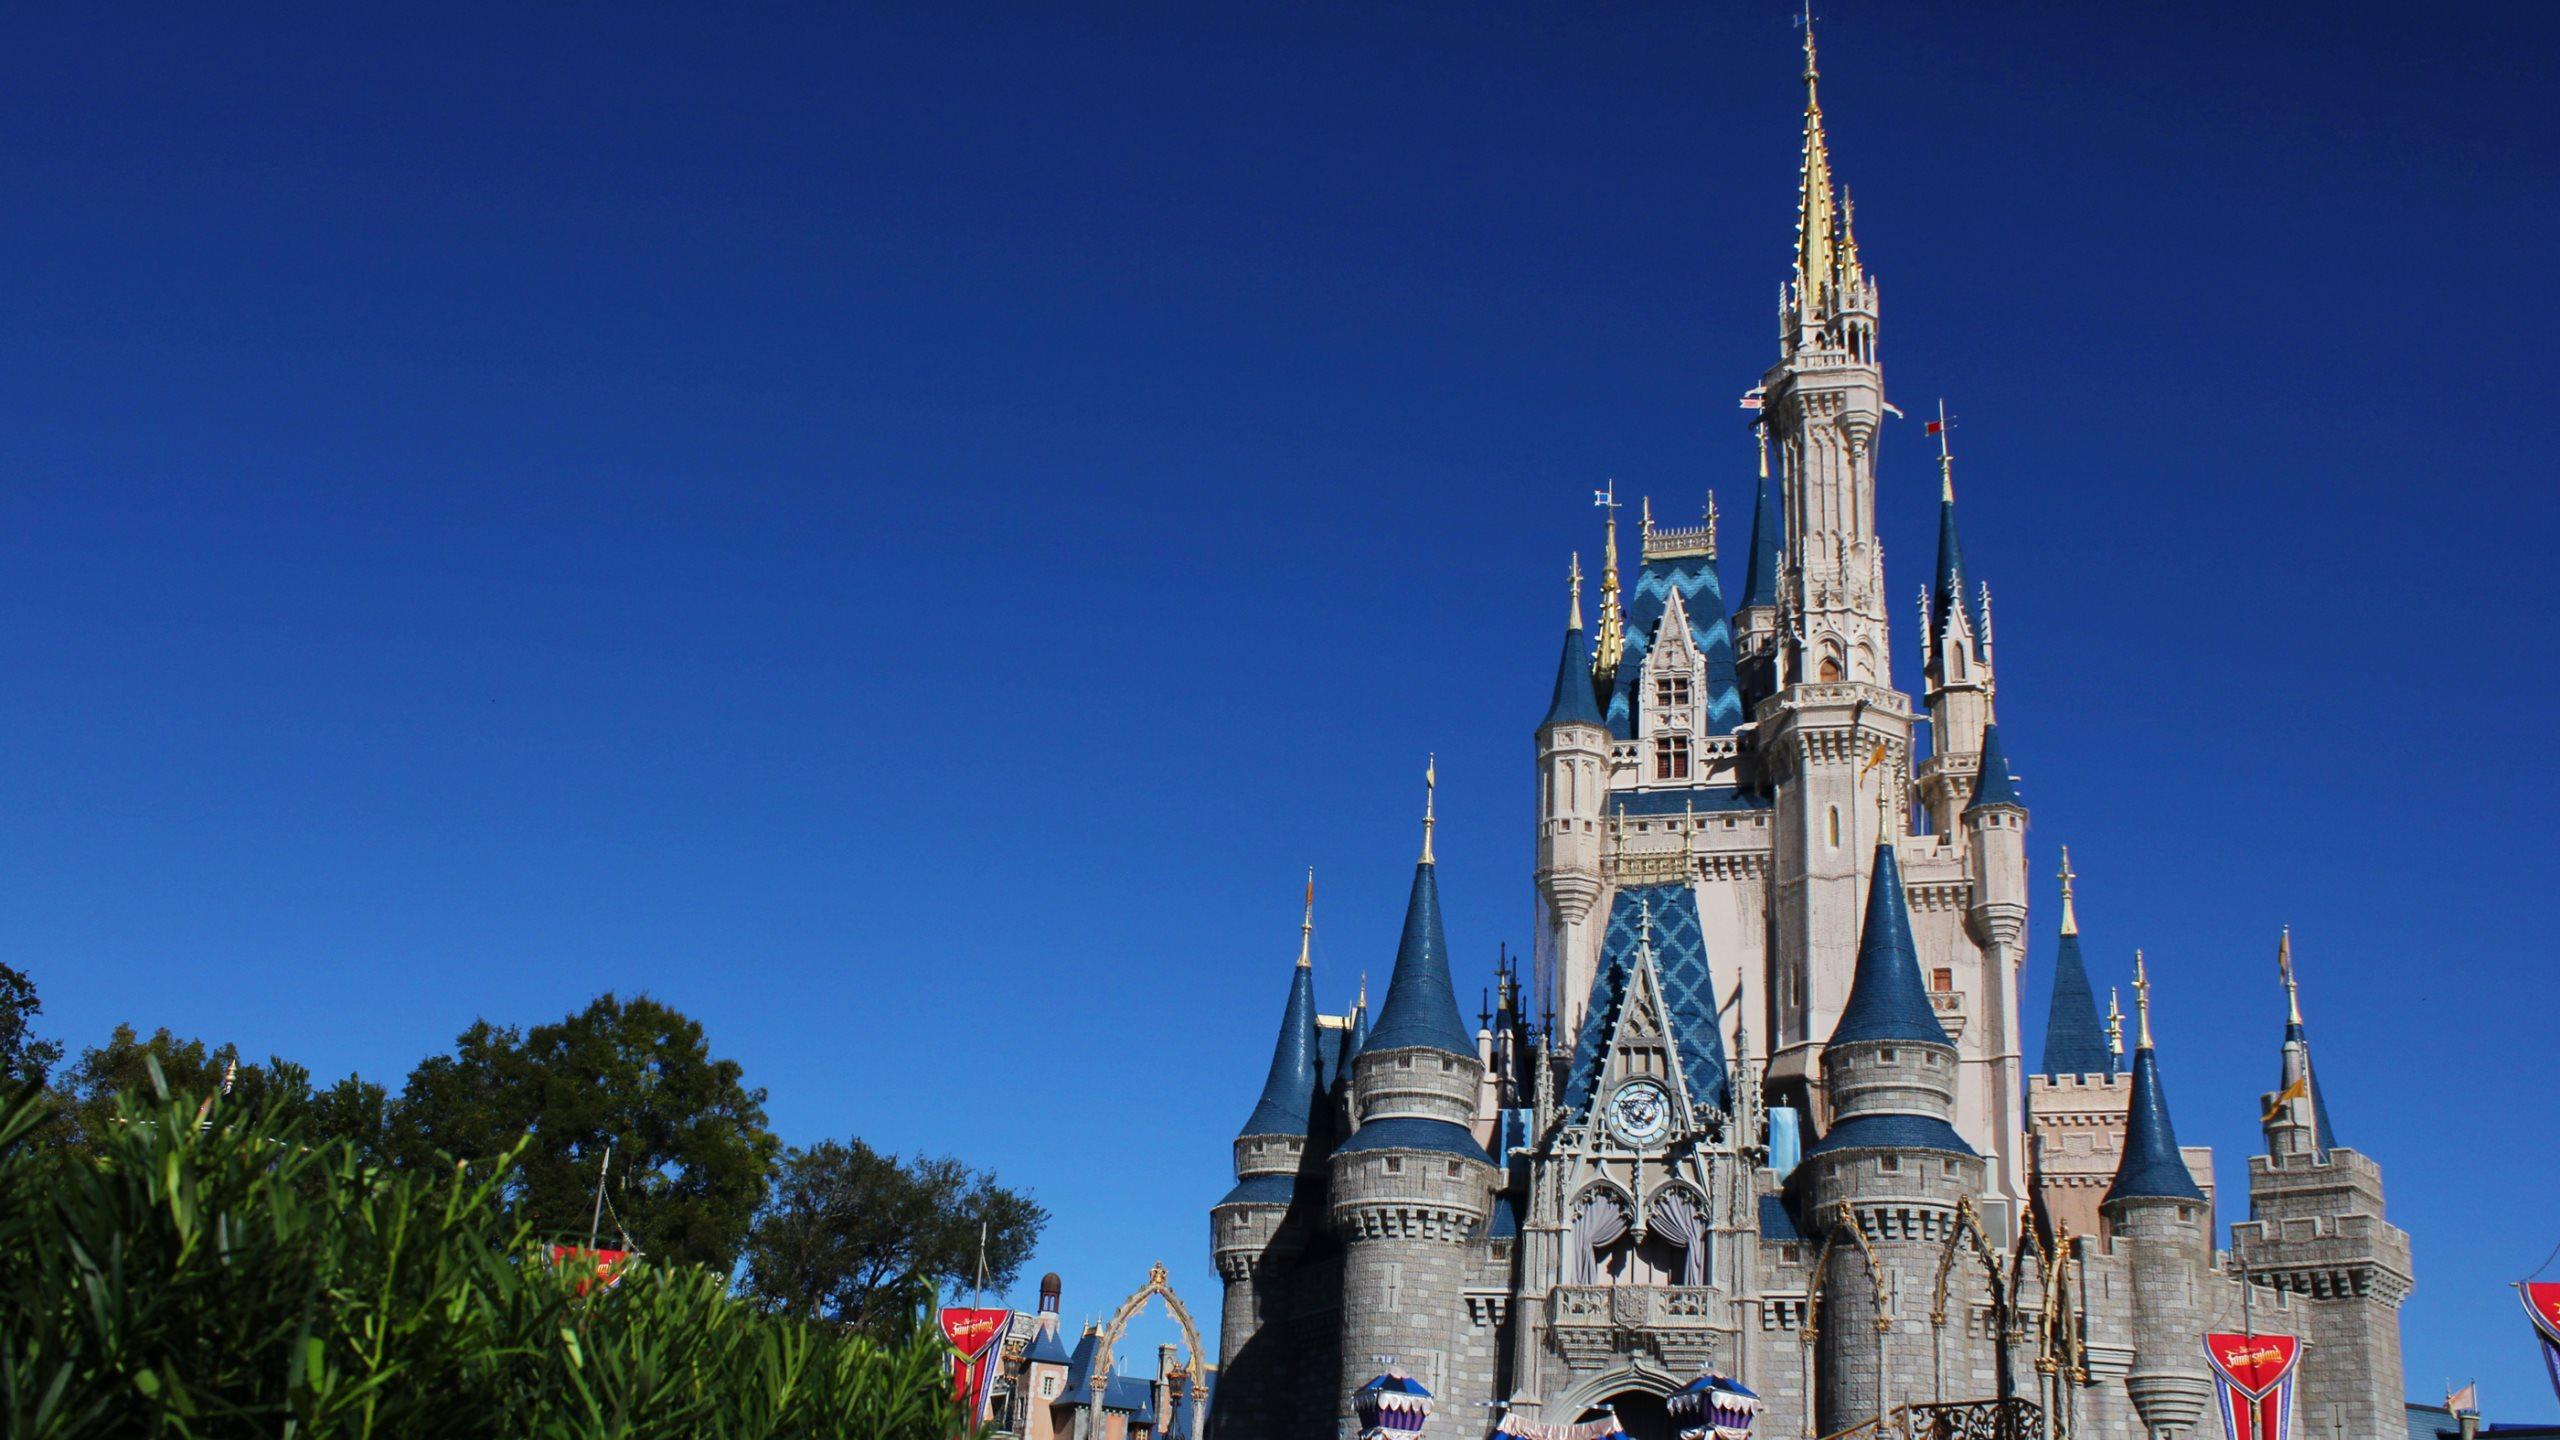 Magic Kingdom Disneyland 2560x1440